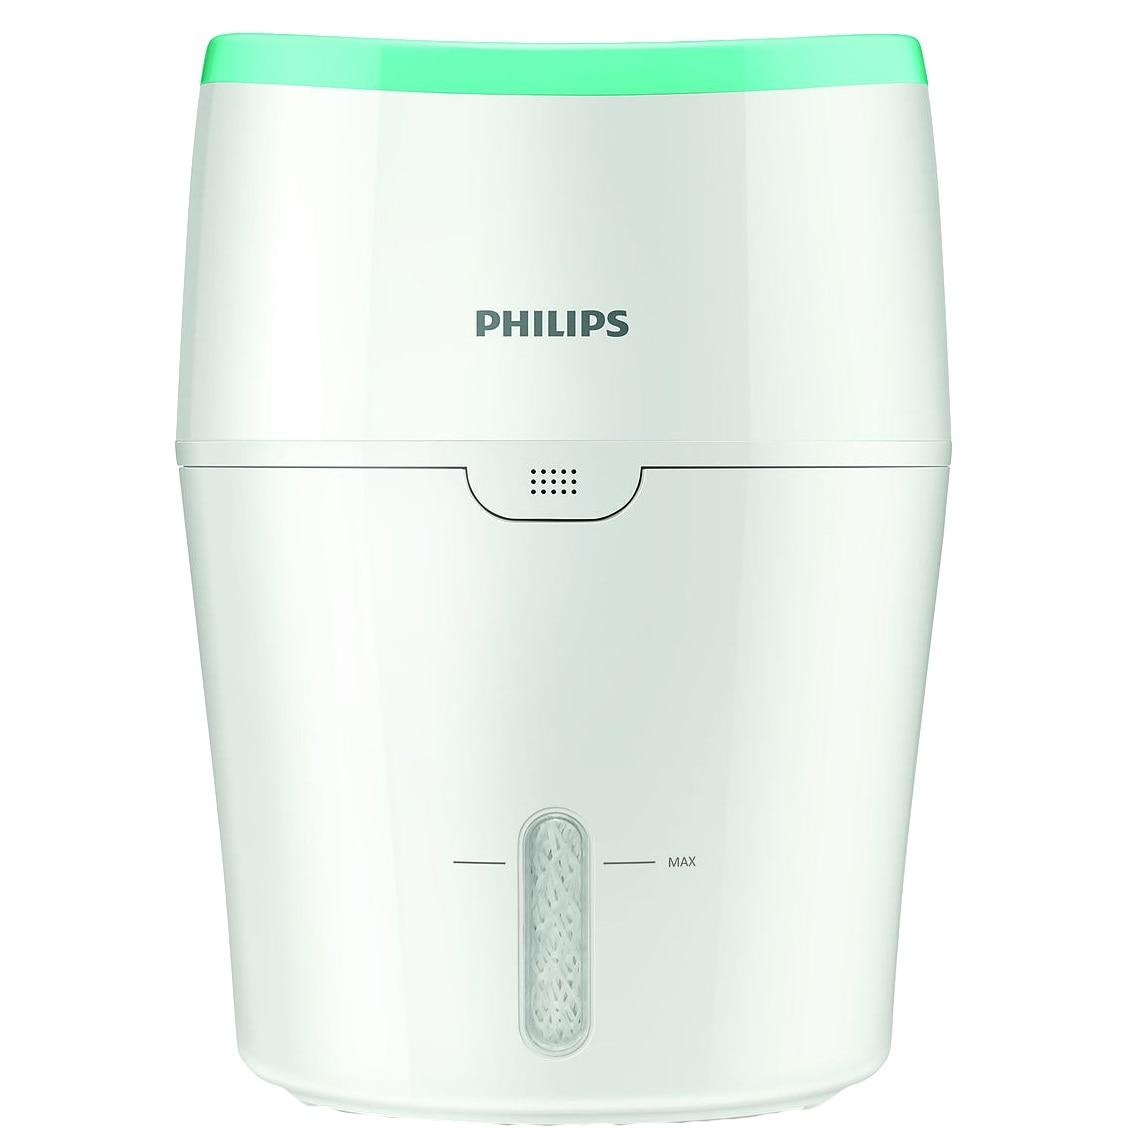 Fotografie Umidificator de aer Philips HU4801/01, Tehnologie NanoCloud, Rezervor 2 l, 200 ml/h, Alb/Verde